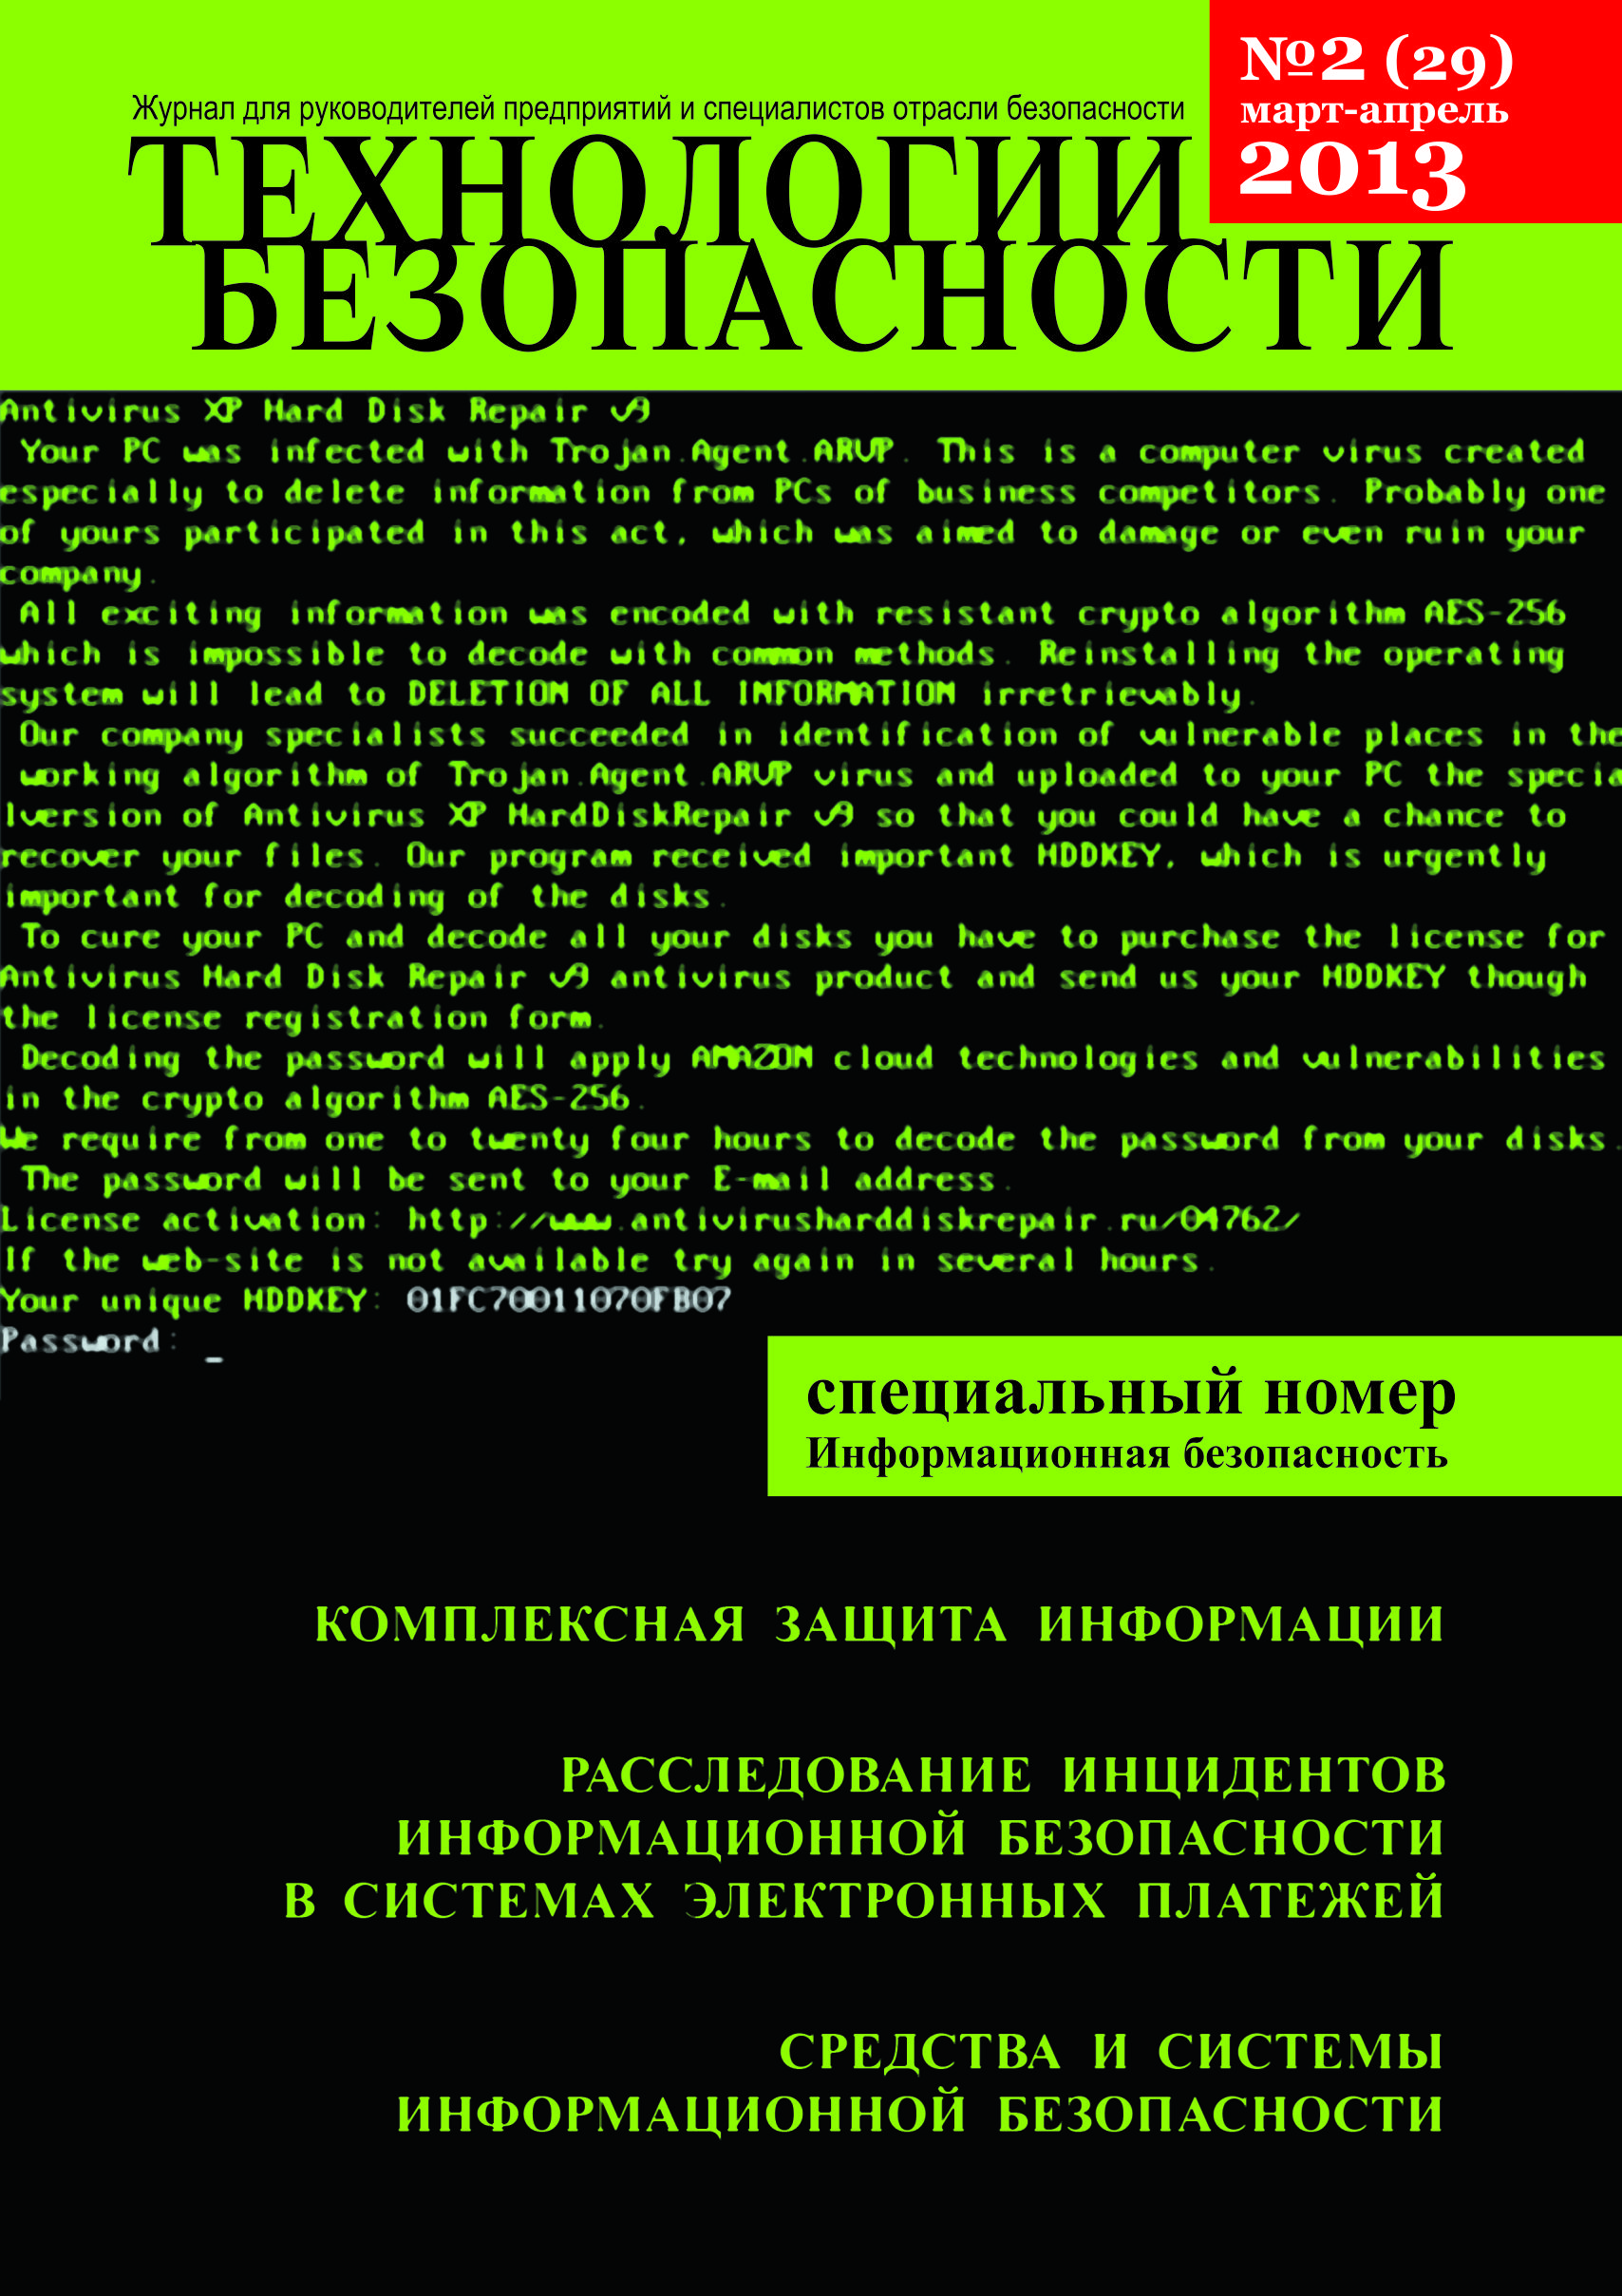 oblozka_TB_02_29_2013_1